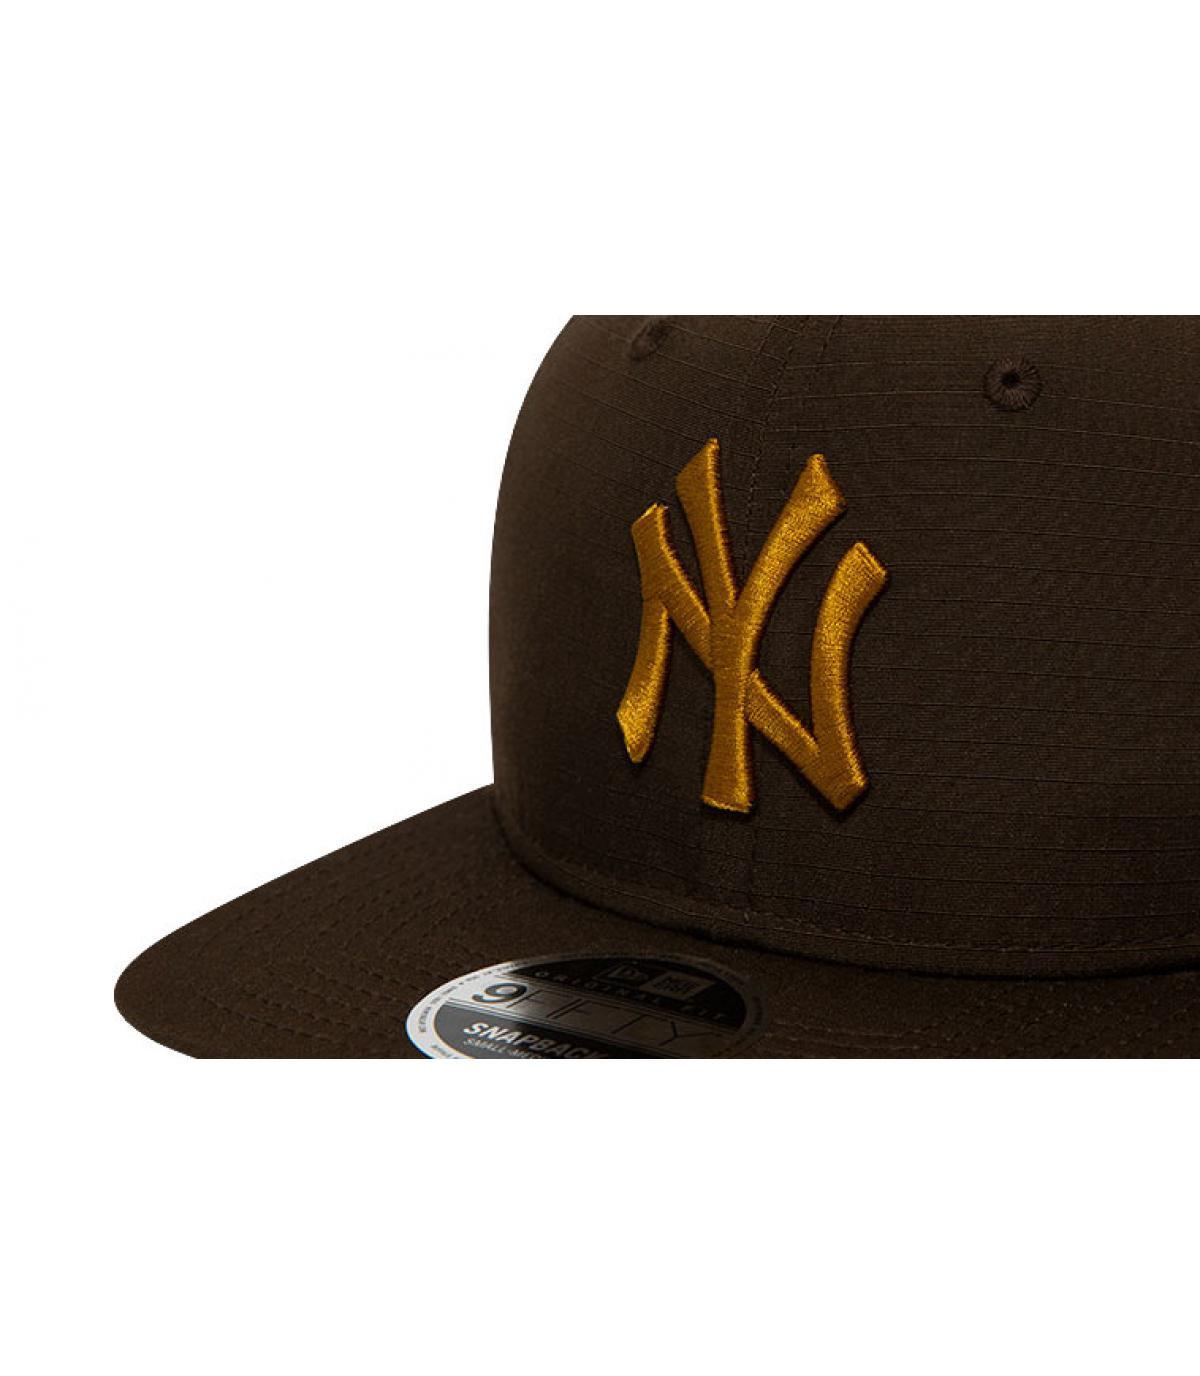 Details Snapback MLB Utility NY 950 brown old gold - Abbildung 3